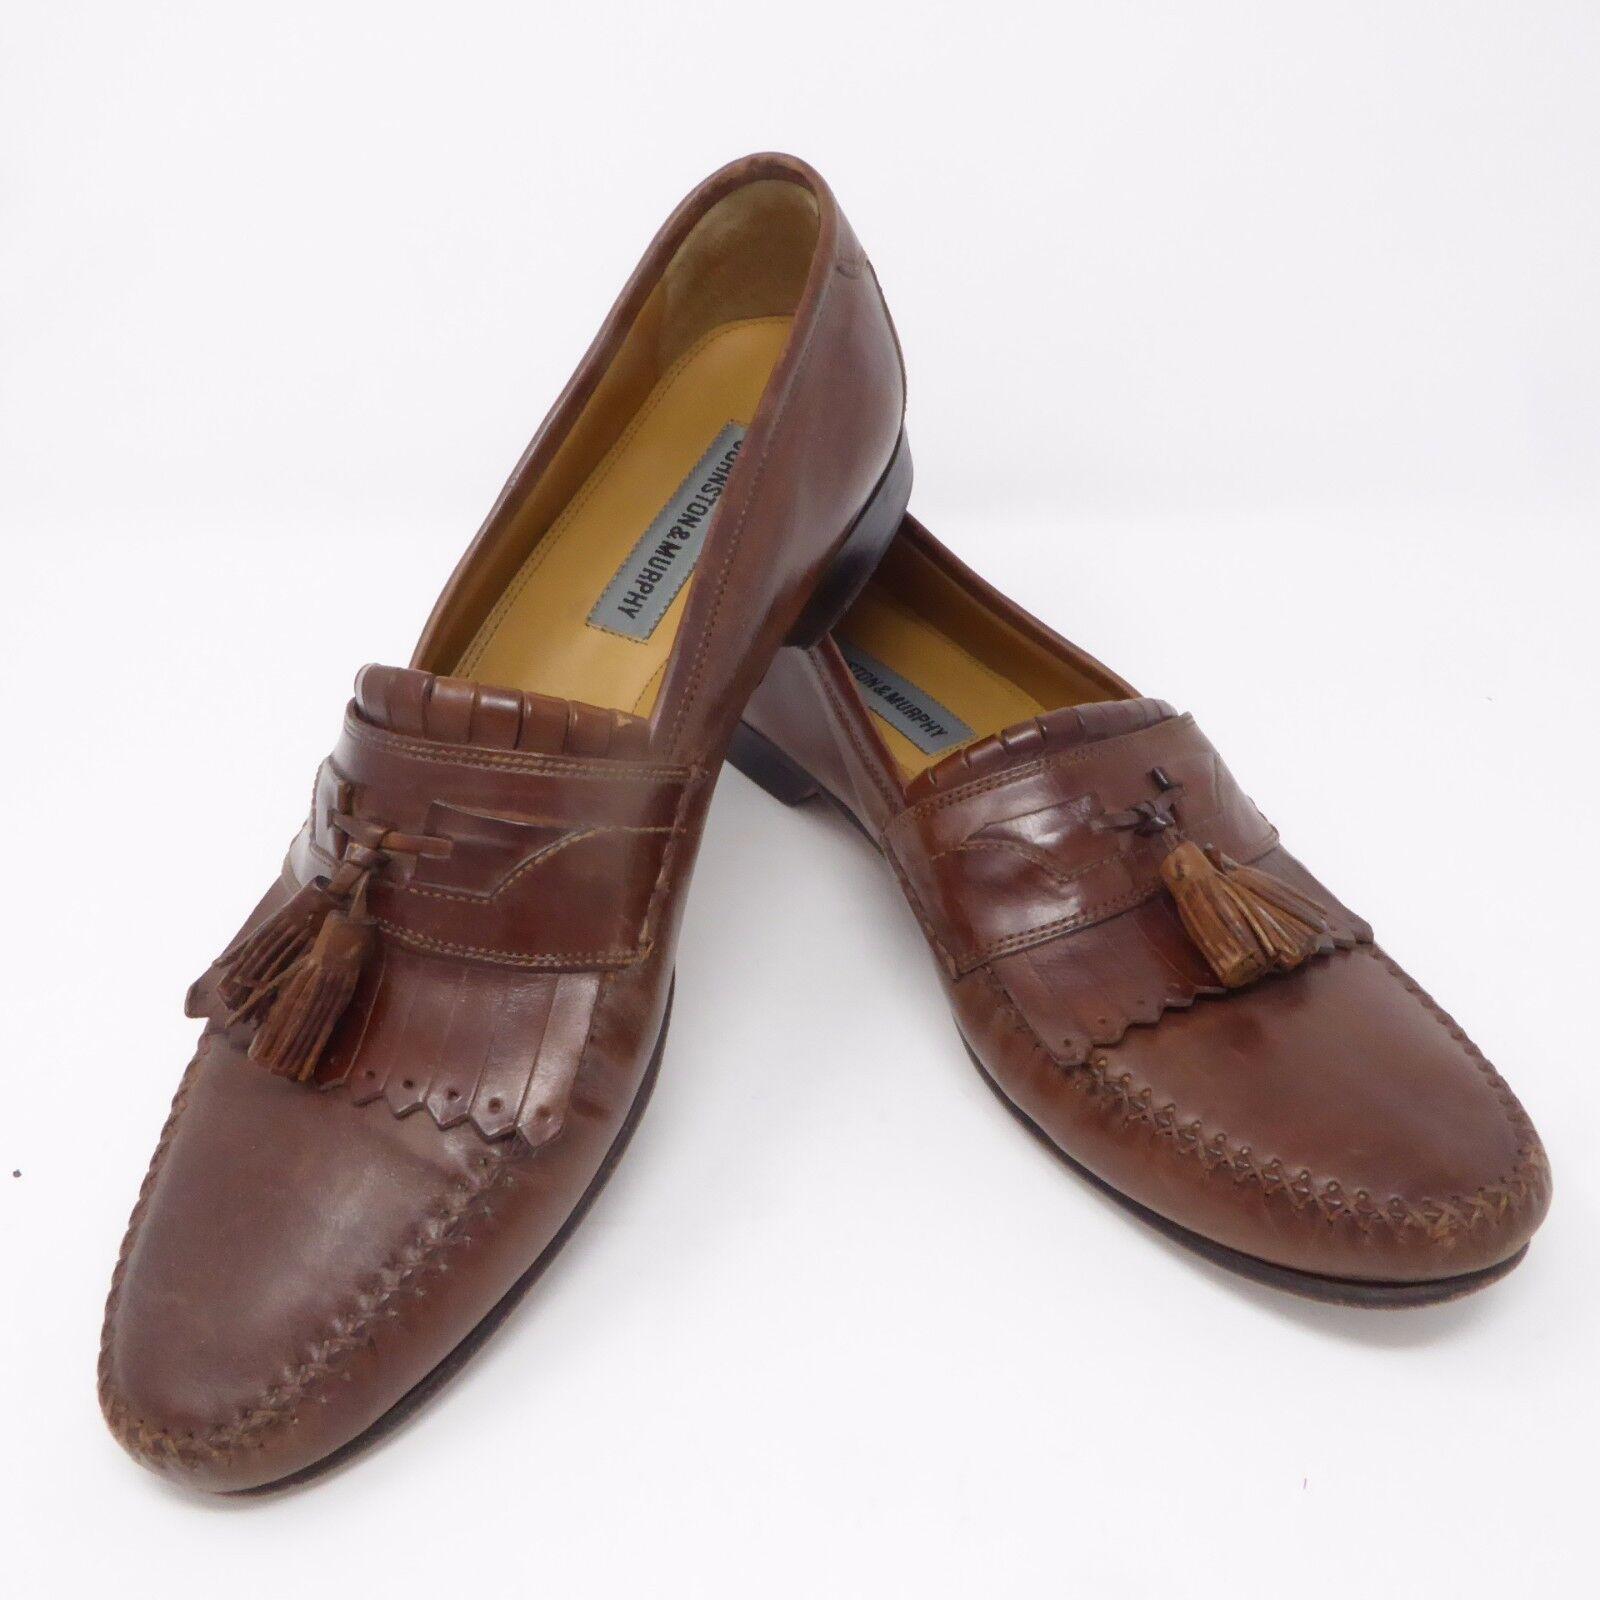 JOHNSTON & MURPHY Marronee Leather Slip On Loafers Tassel sautope Dimensione 11 N NARROW Sautope classeiche da uomo